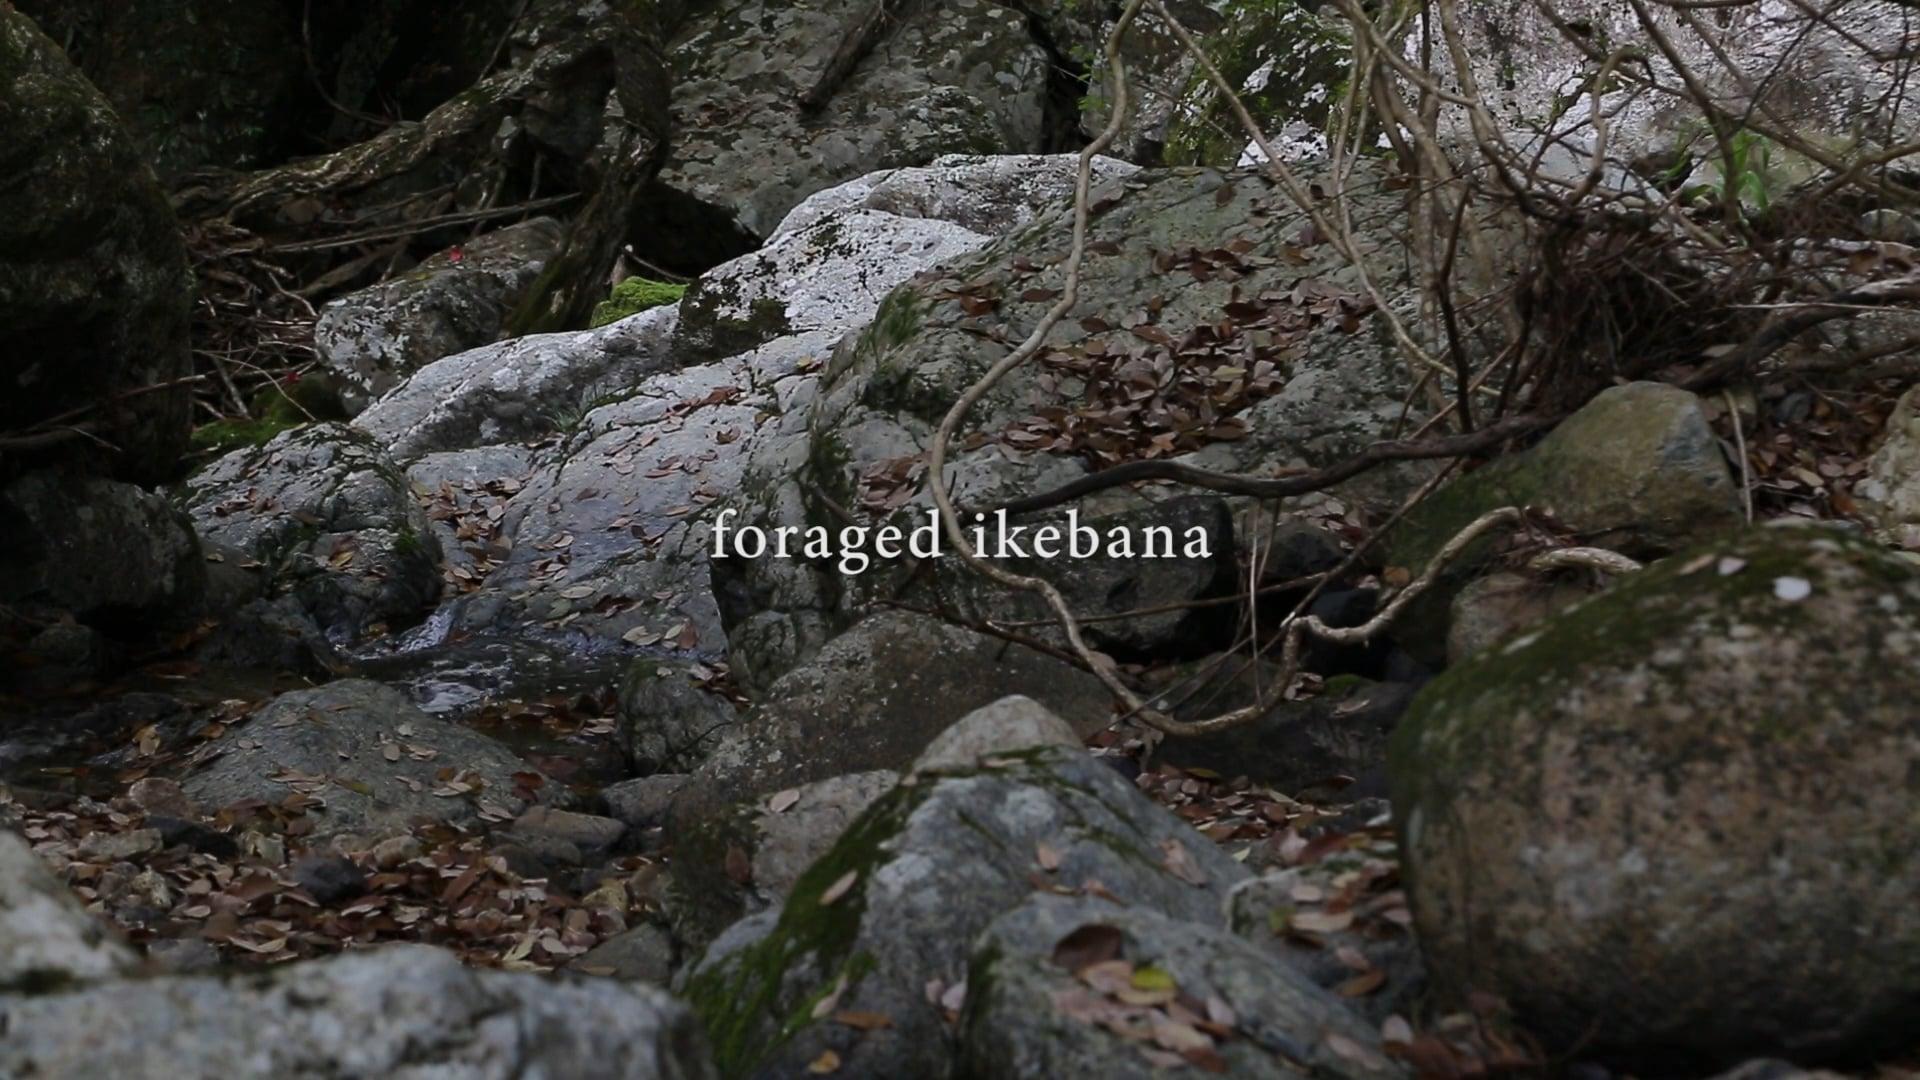 foraged ikebana 02:rurikei